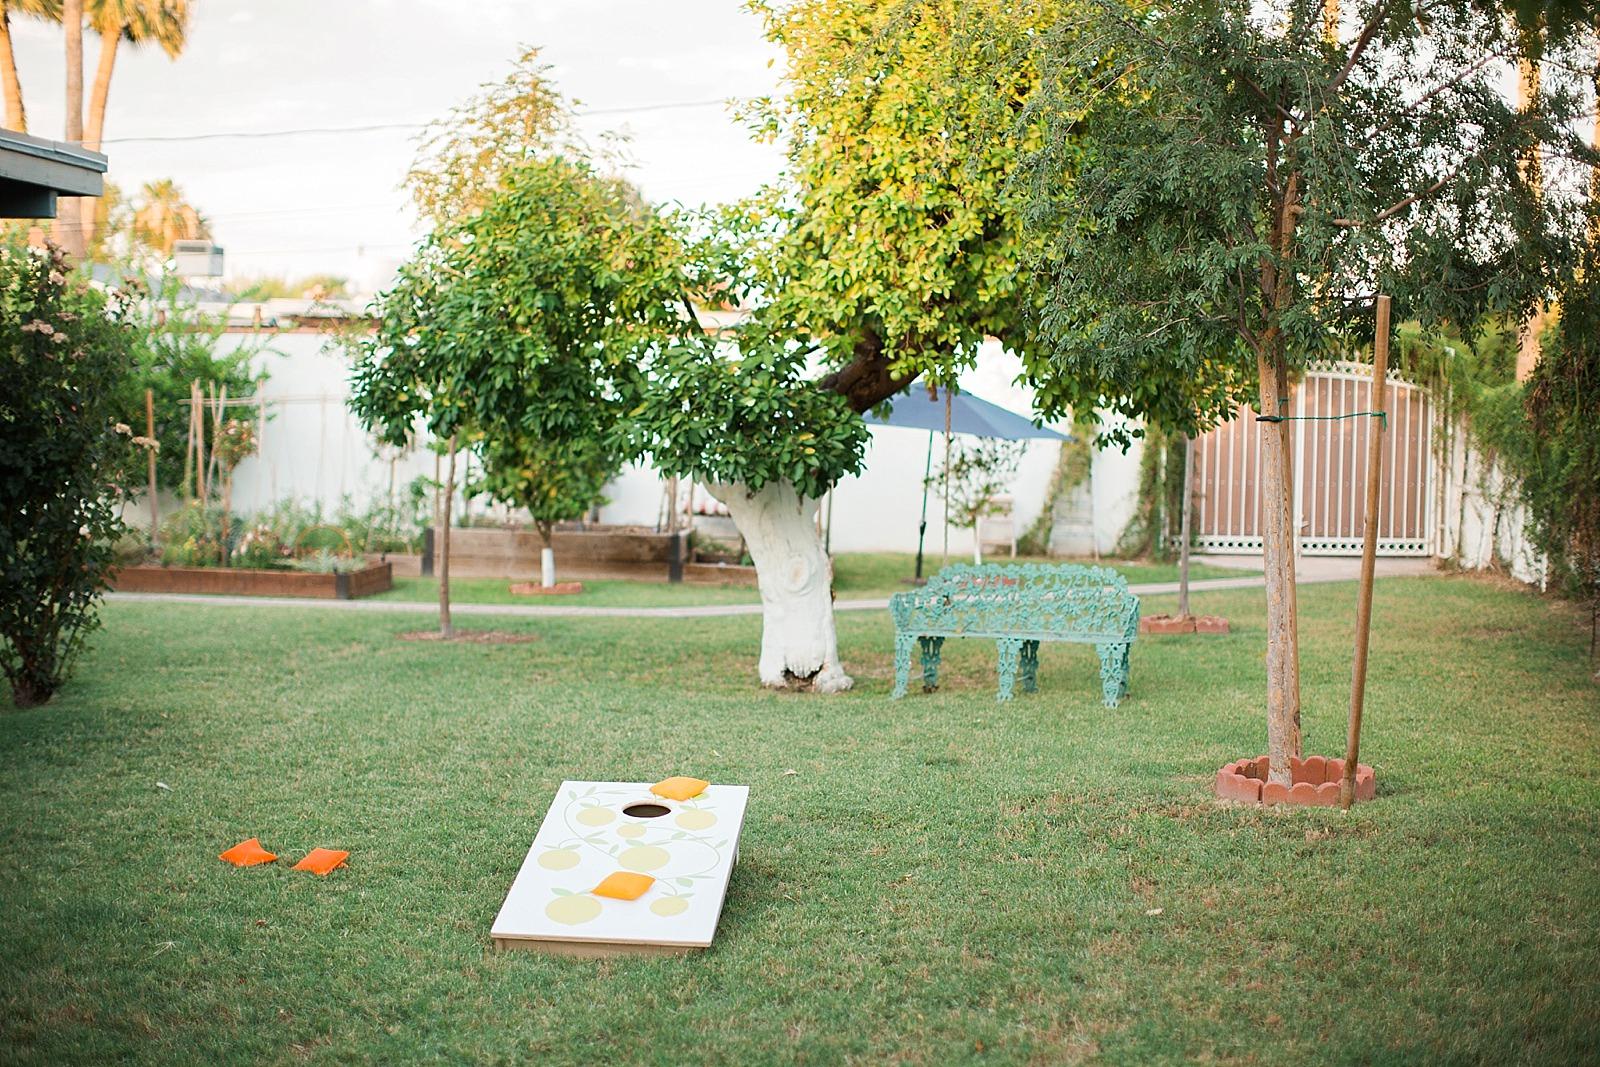 diana-elizabeth-steffen-phoenix-blogger-backyard-games-tosso-com-corn-hole-cornhole-citrus-theme_0095